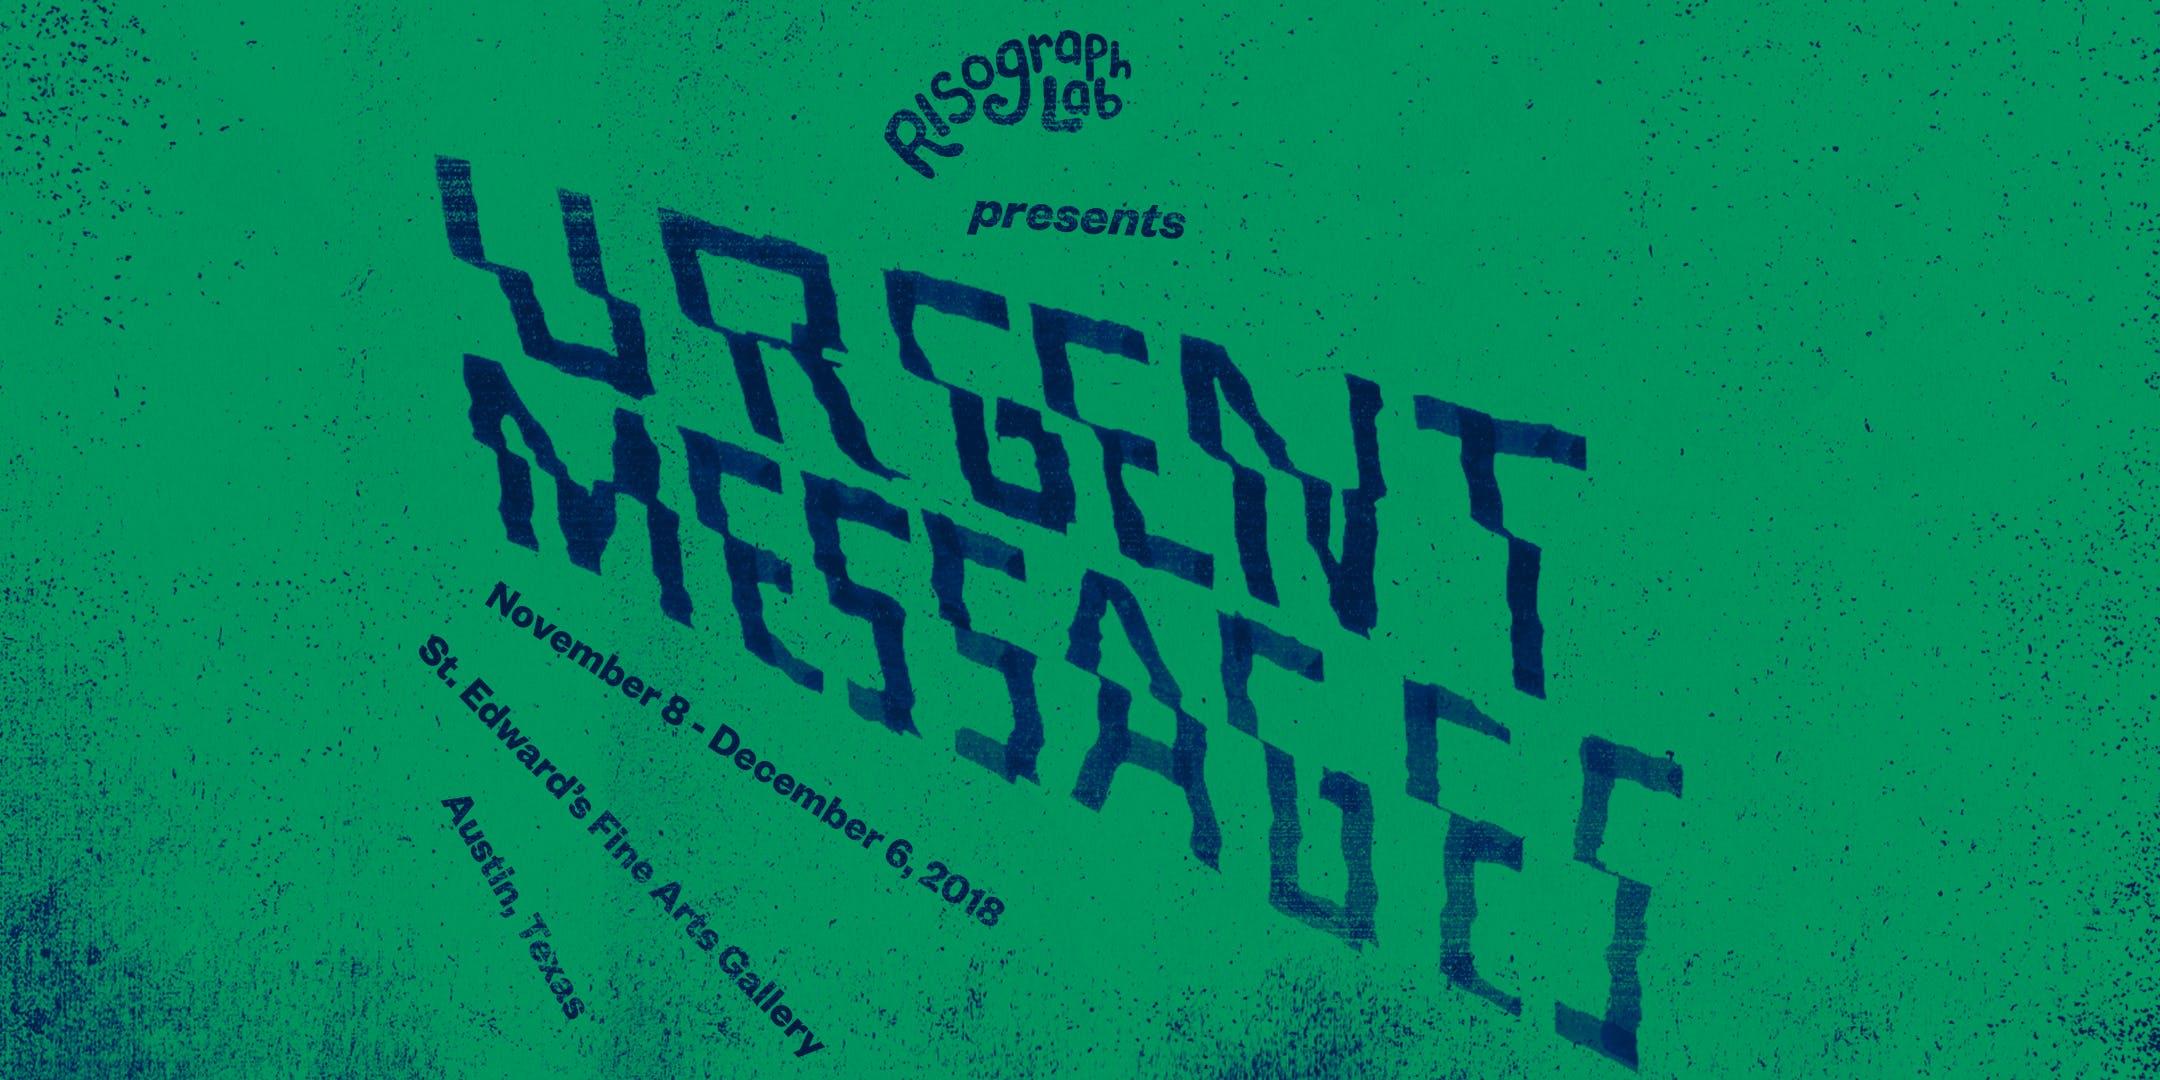 Risograph Poster Workshop: URGENT MESSAGES!